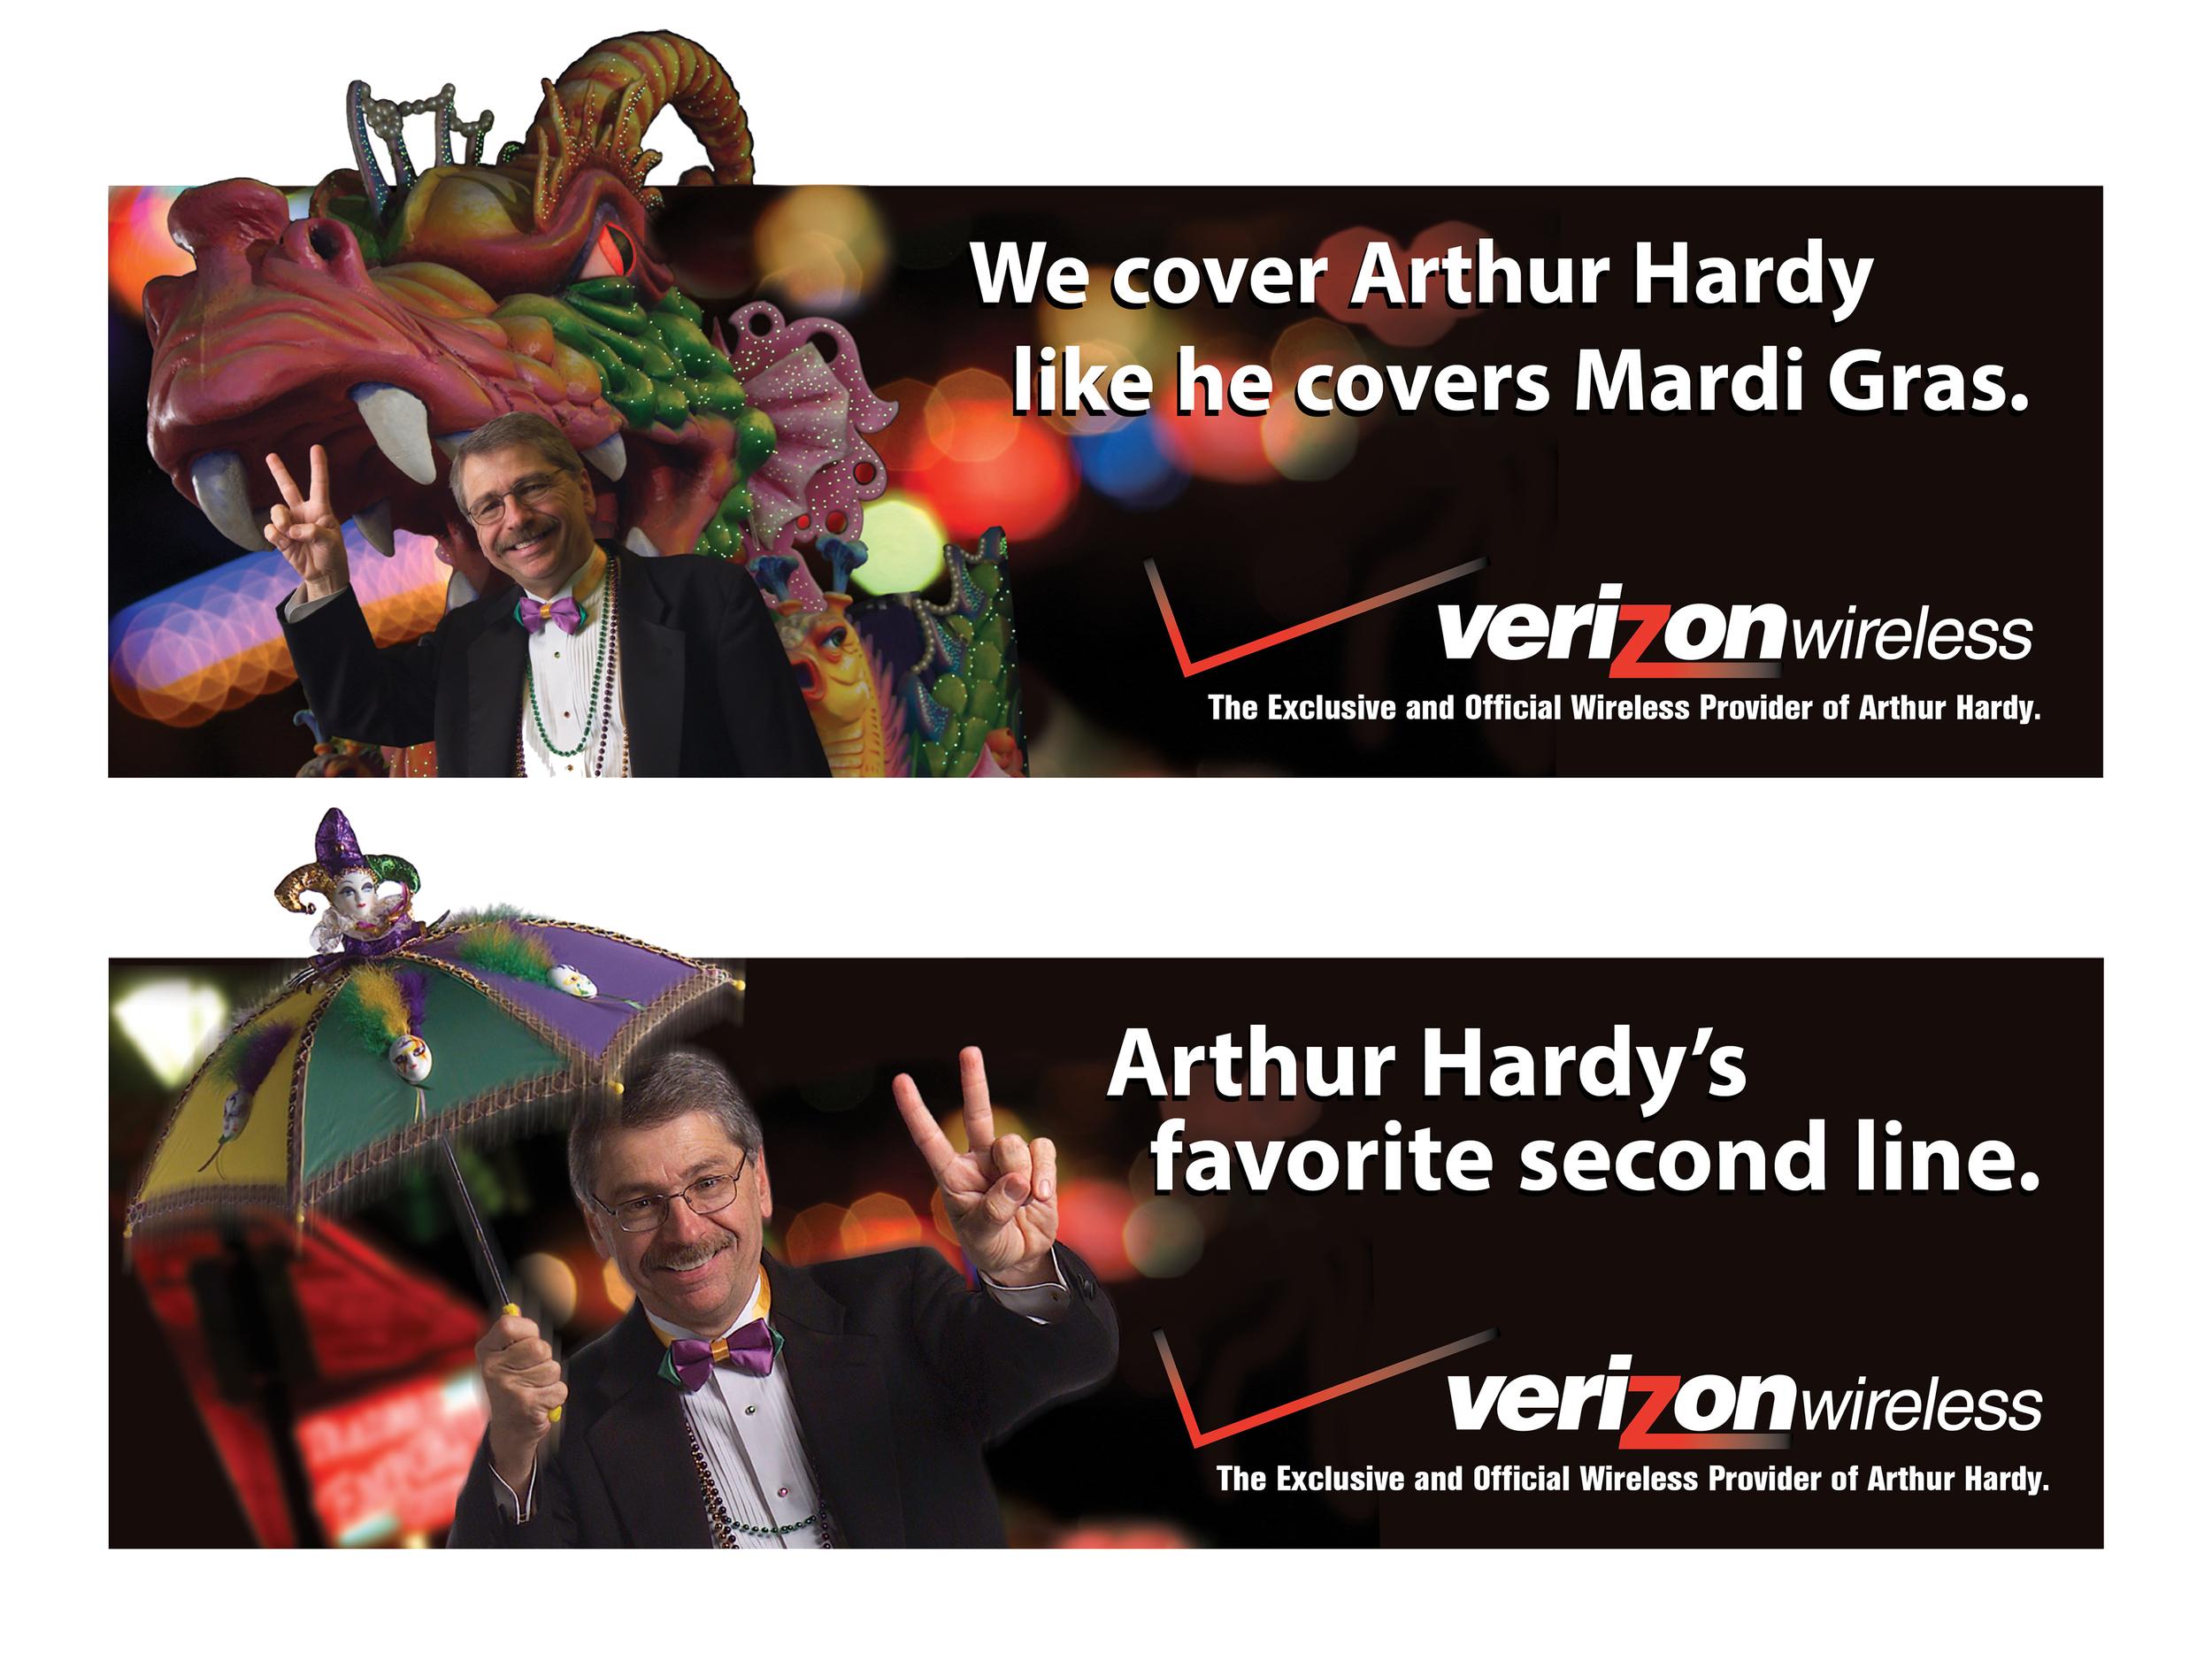 Verizon Wireless Arthur Hardy Outdoor Boards